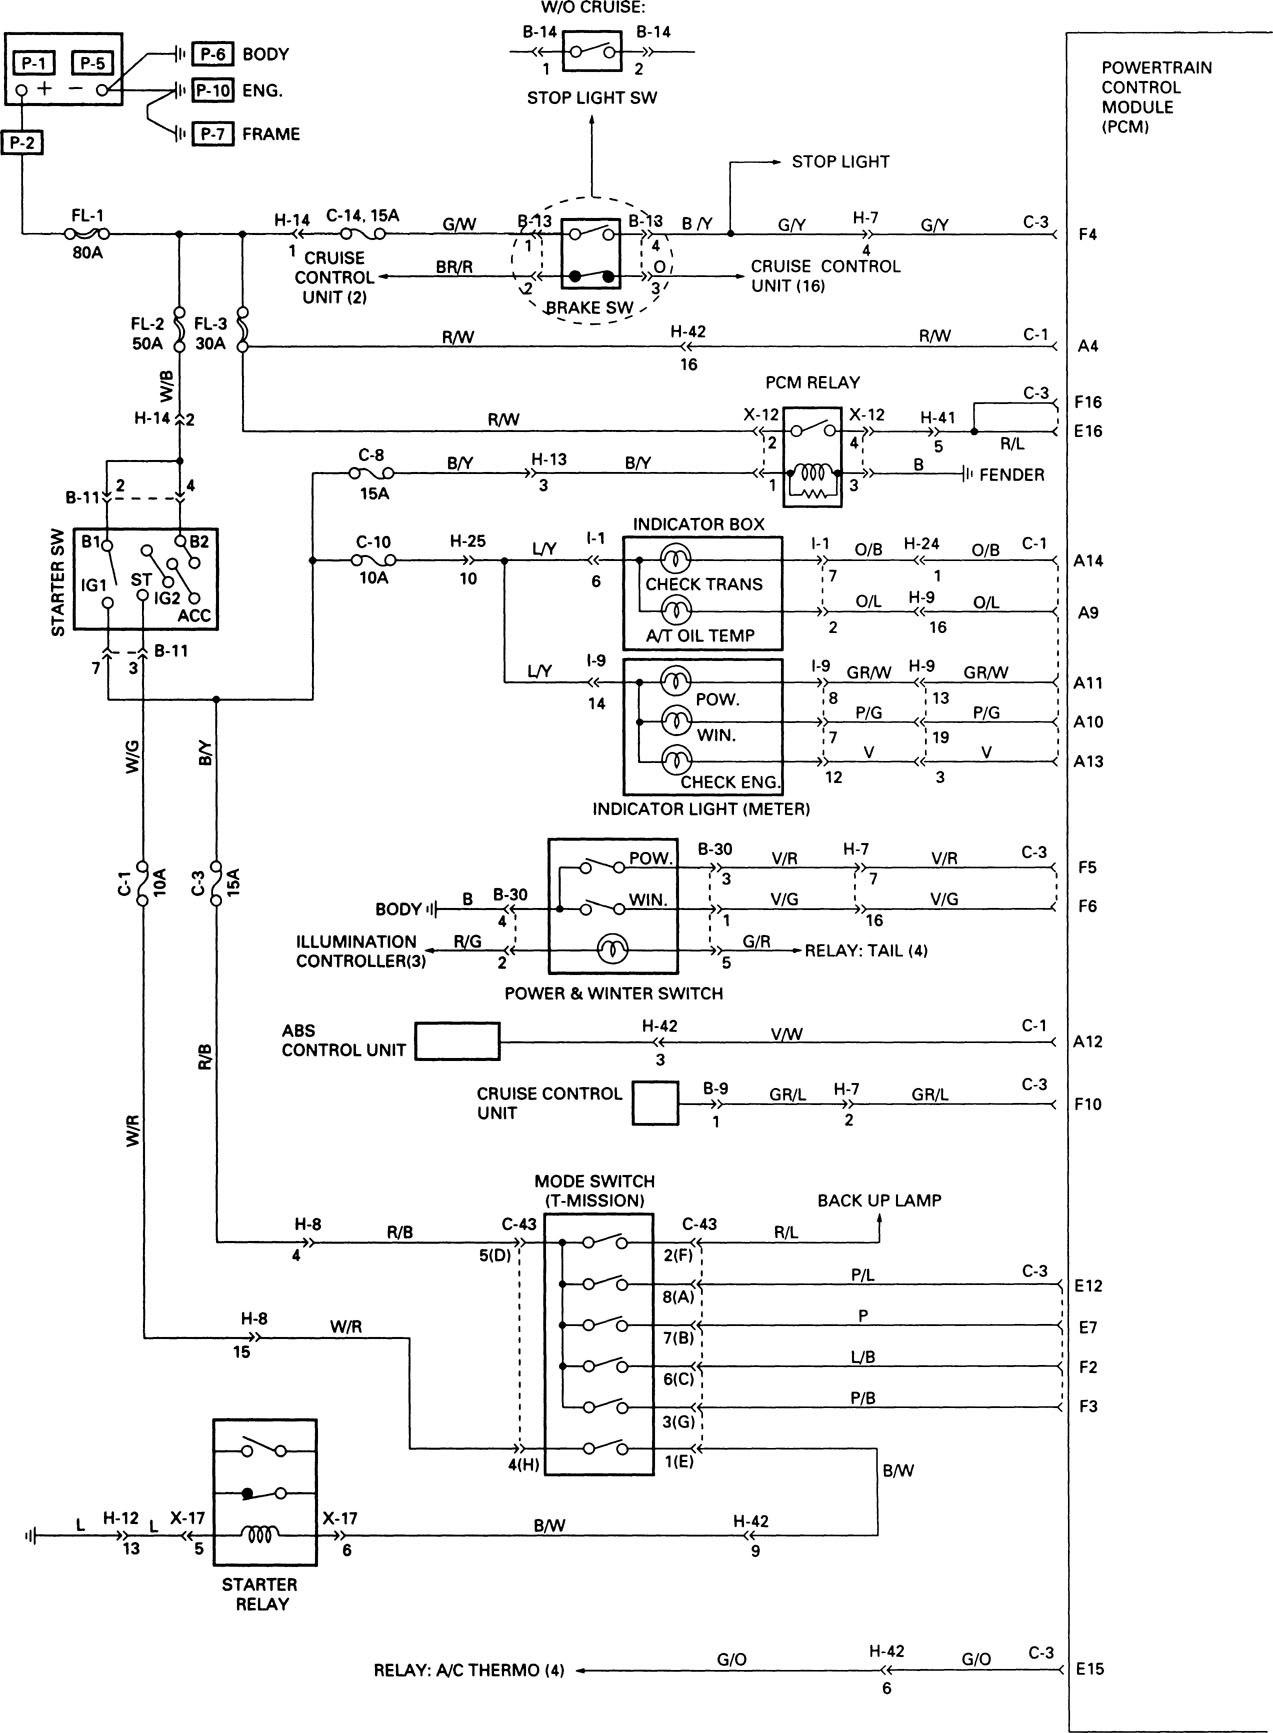 Acura SLX (1998 - 1999) - wiring diagrams - transmission controls -  Carknowledge.info | 1998 Acura Slx Wiring Diagram |  | Carknowledge.info